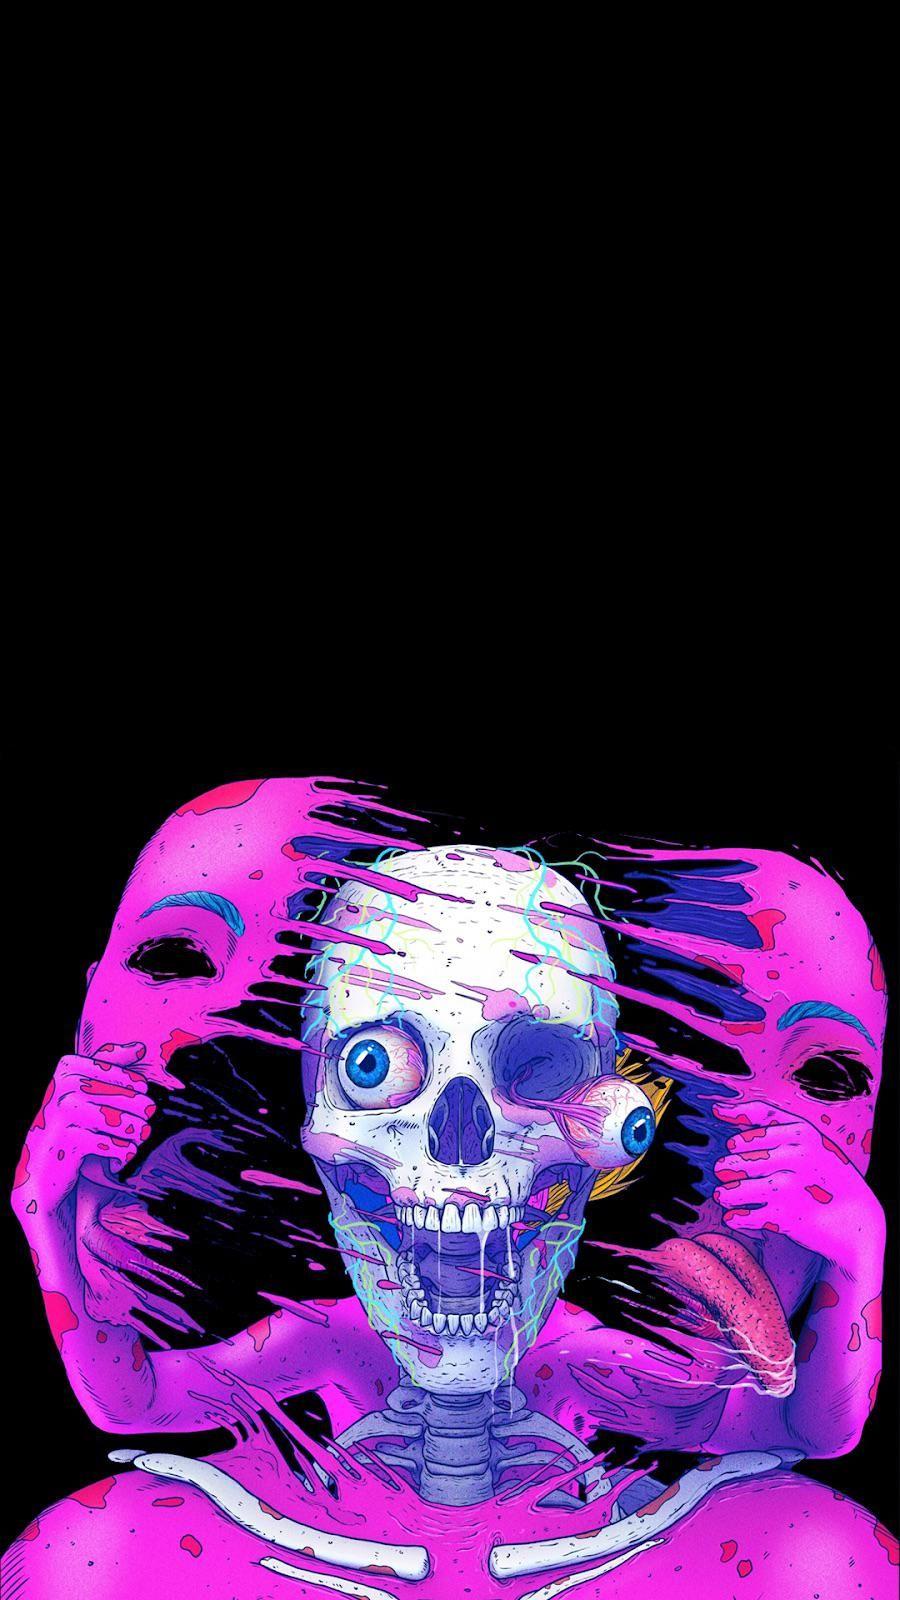 for OLED screens in 2020 Skull wallpaper, Cool wallpaper